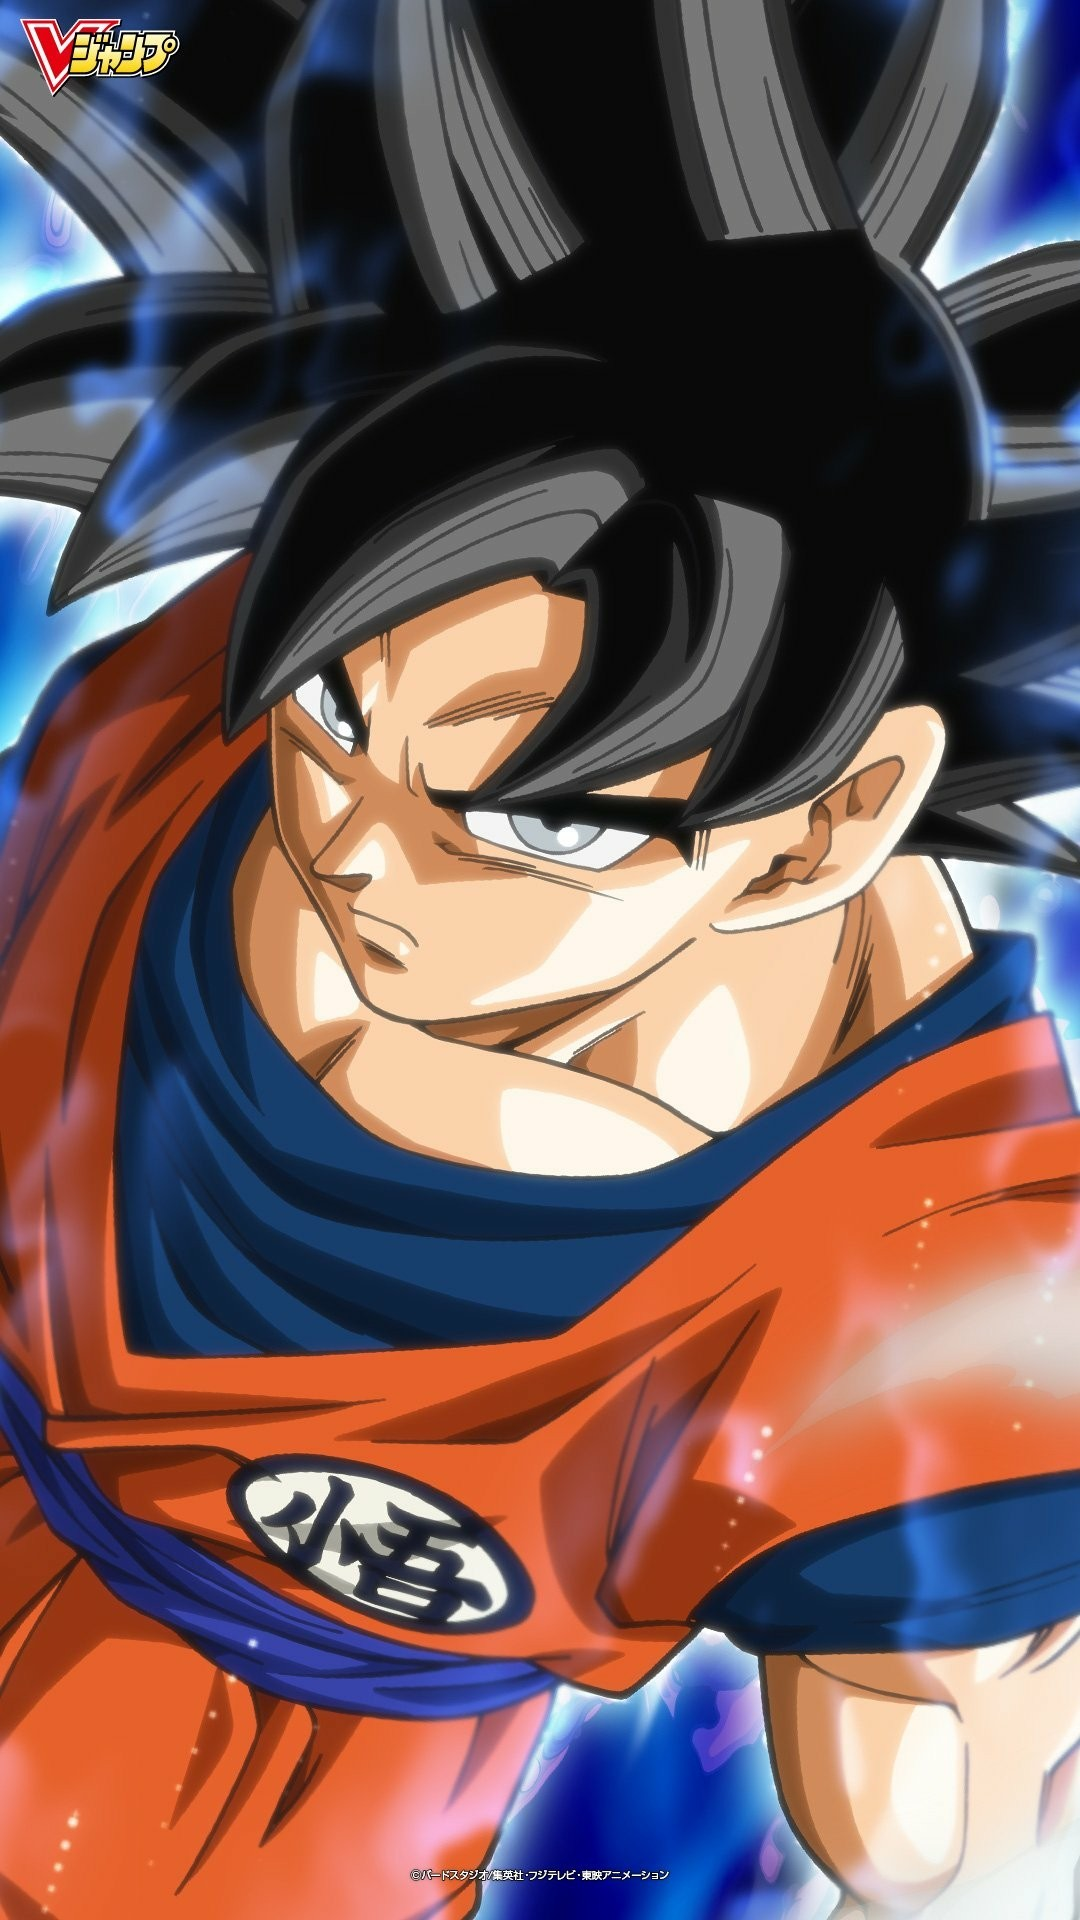 Res: 1080x1920, V-Jump Official Ultra Instinct Goku Wallpaper!